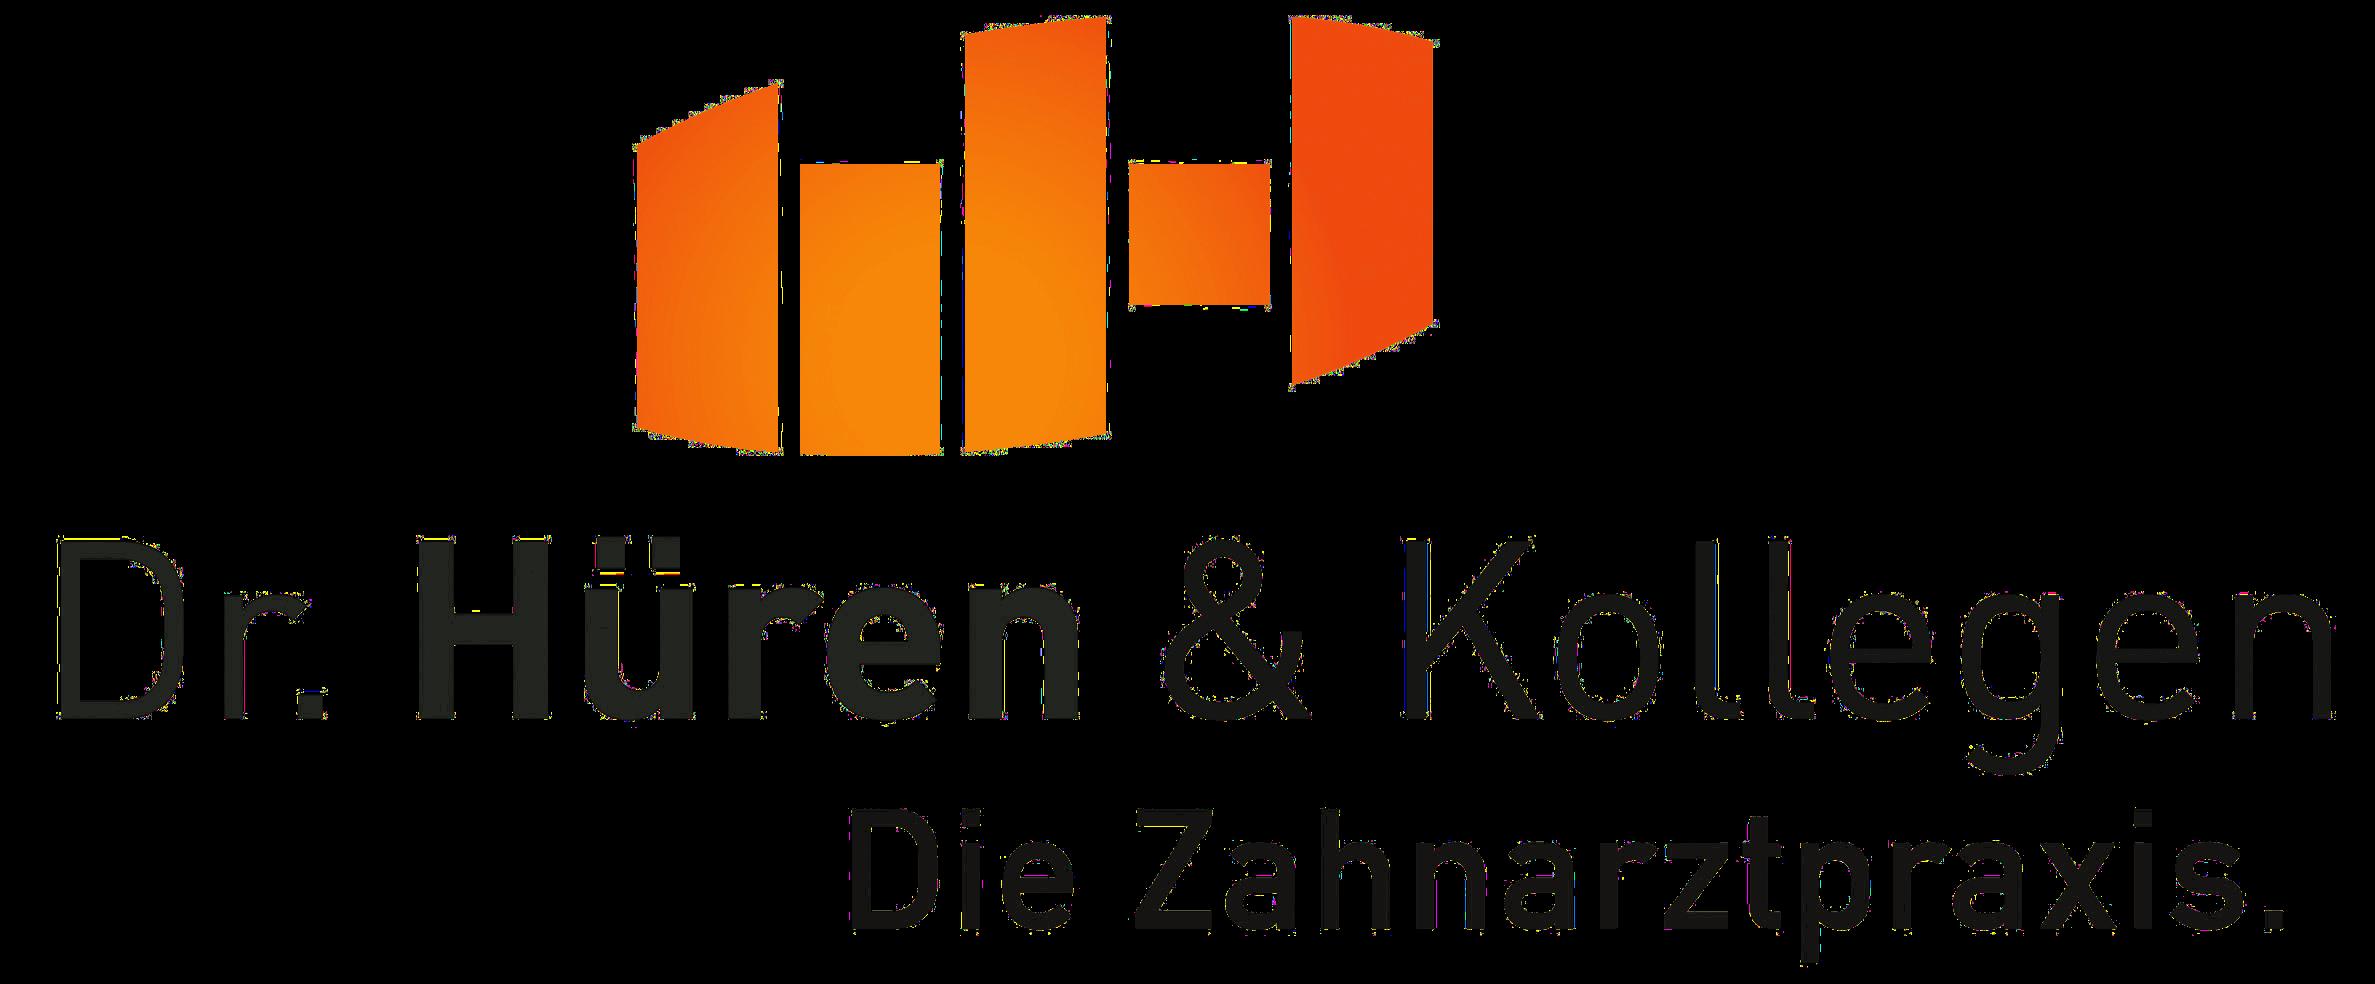 Zahnarzt Mönchengladbach – Hüren & Kollegen